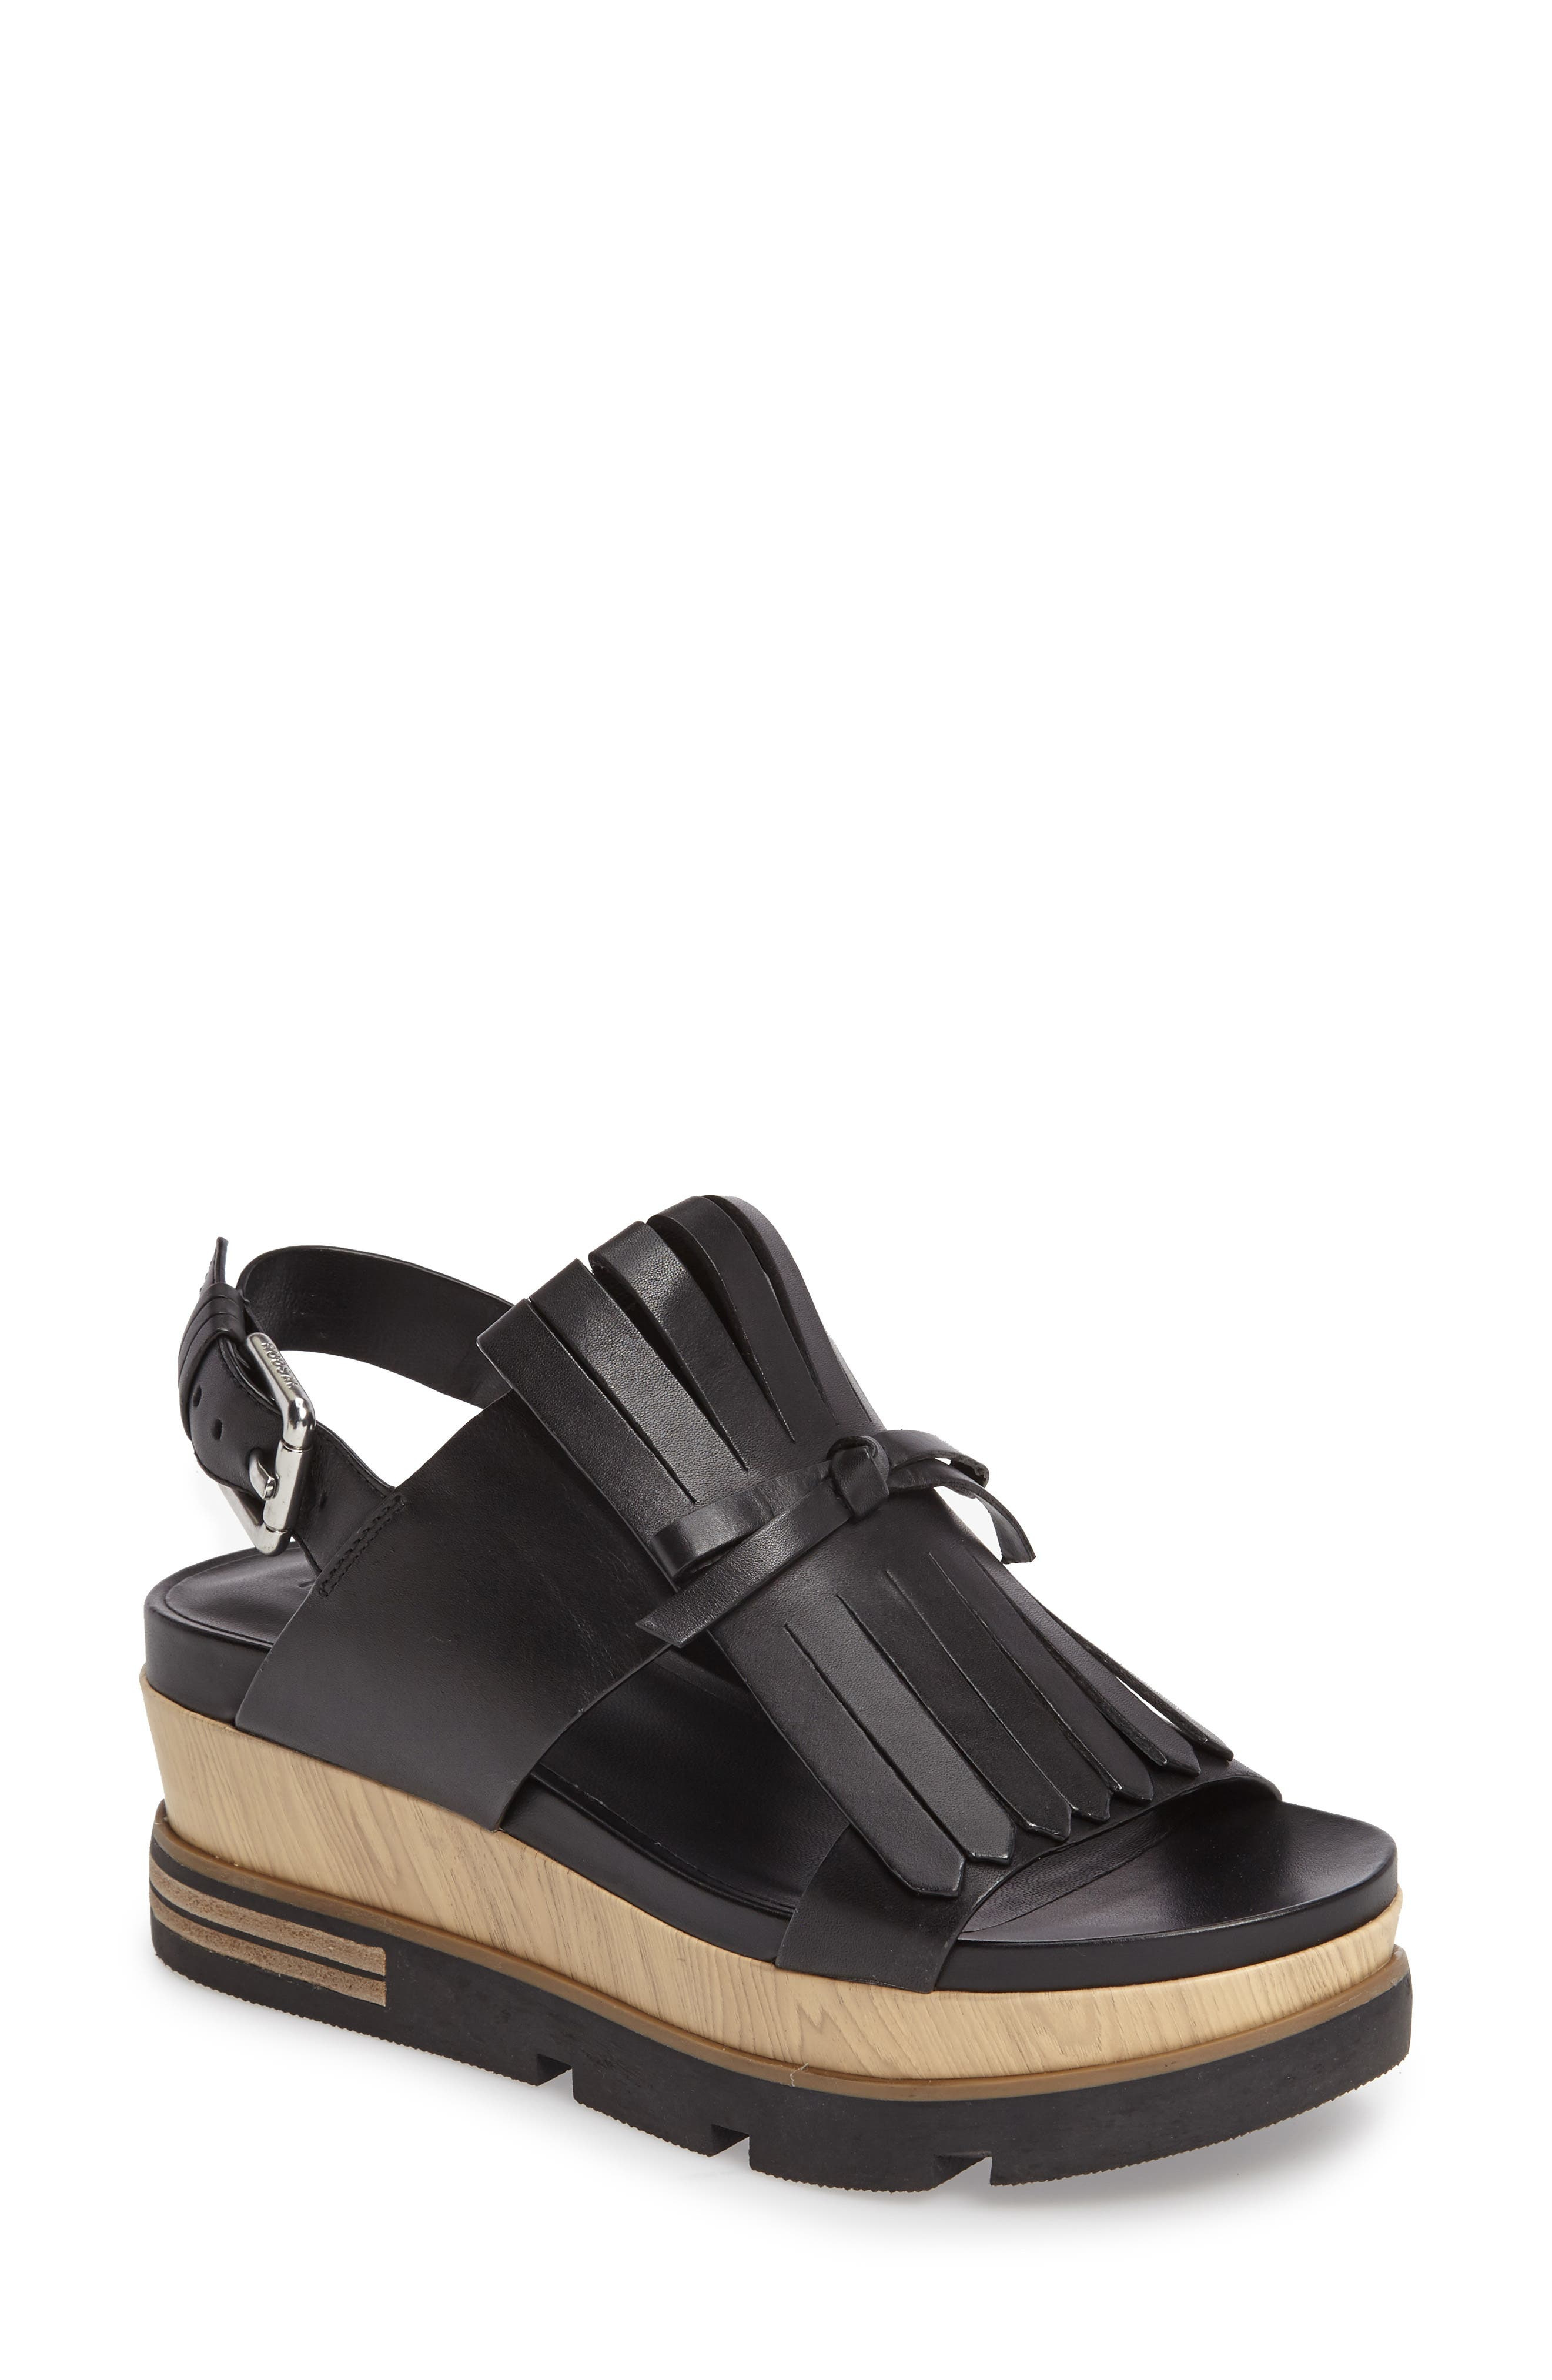 Alternate Image 1 Selected - Rudsak Regina Platform Sandal (Women)